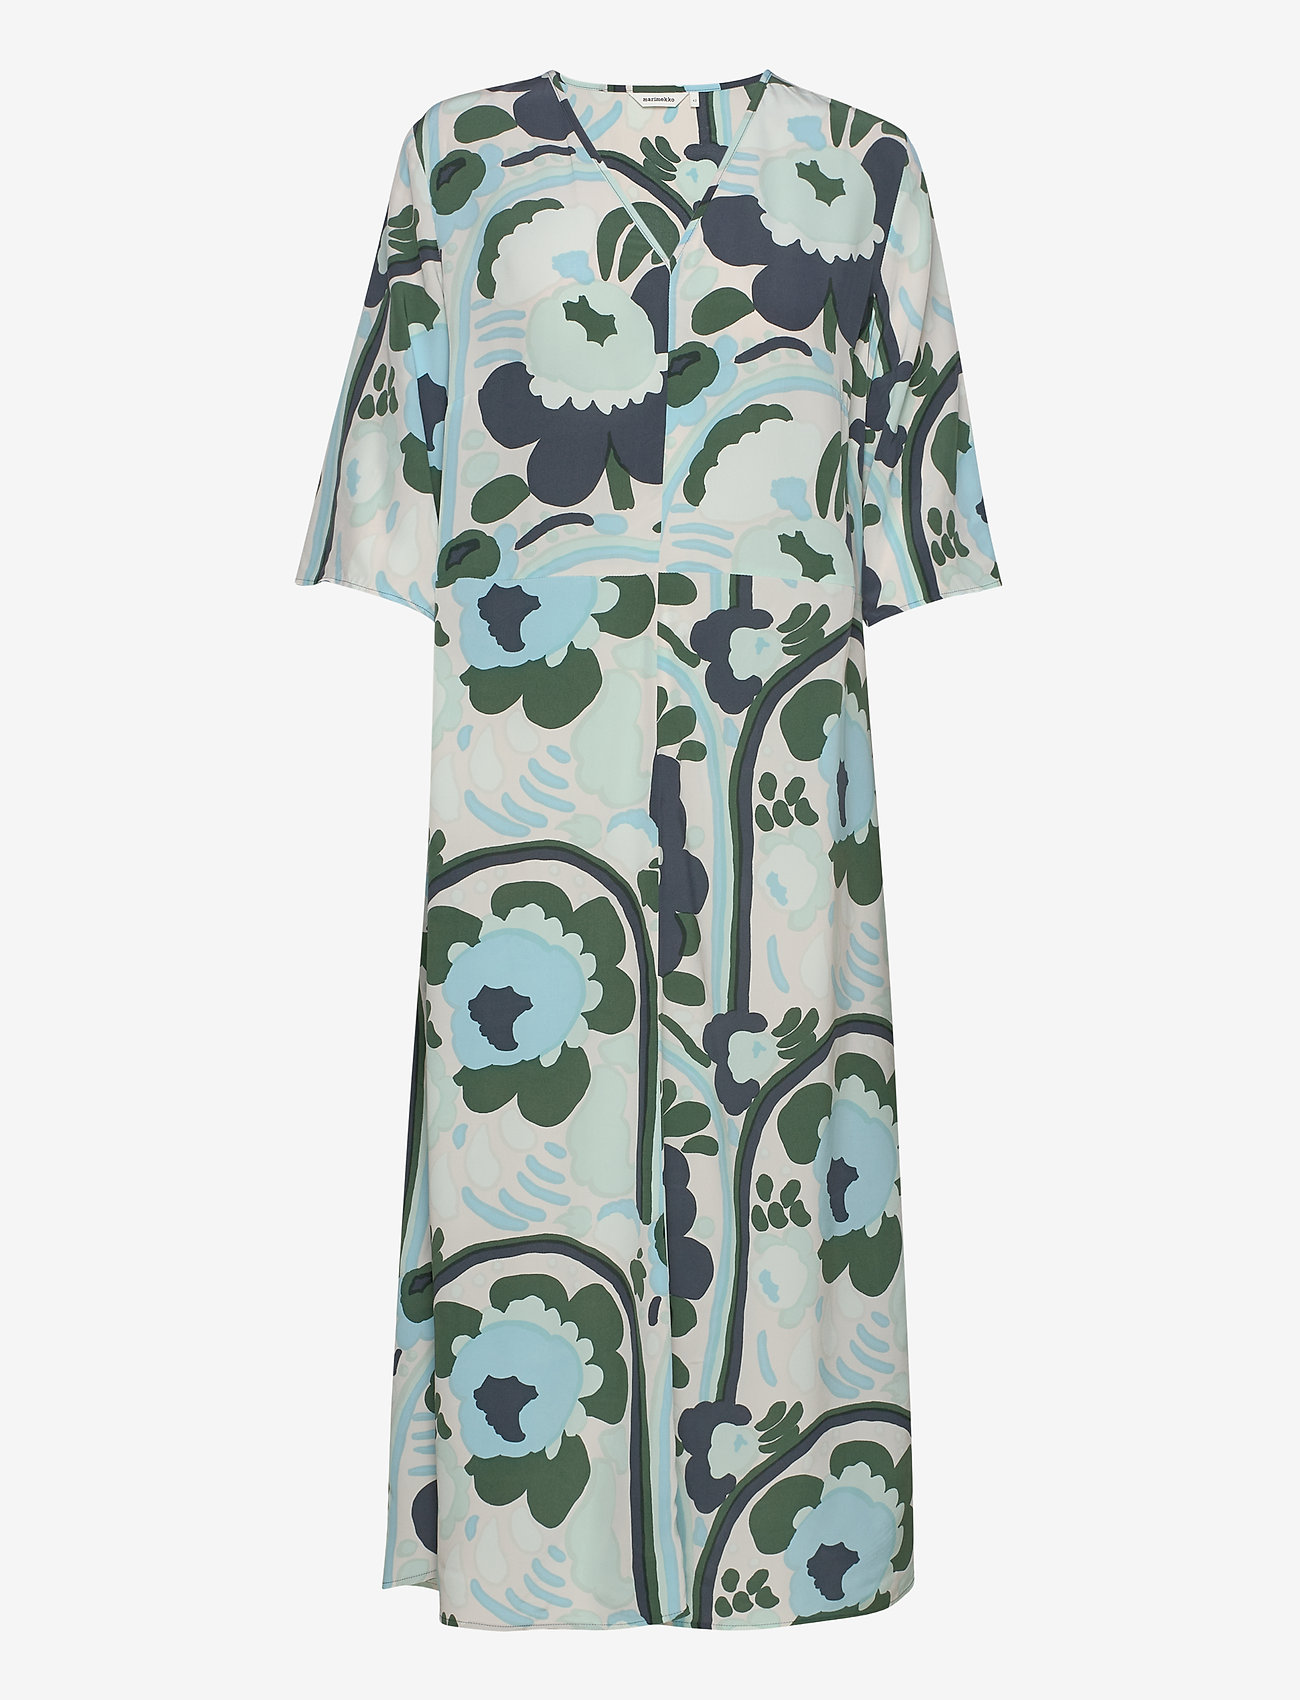 Marimekko - SOLMU KARUSELLI - midi kjoler - beige, dark green, turquoise - 0